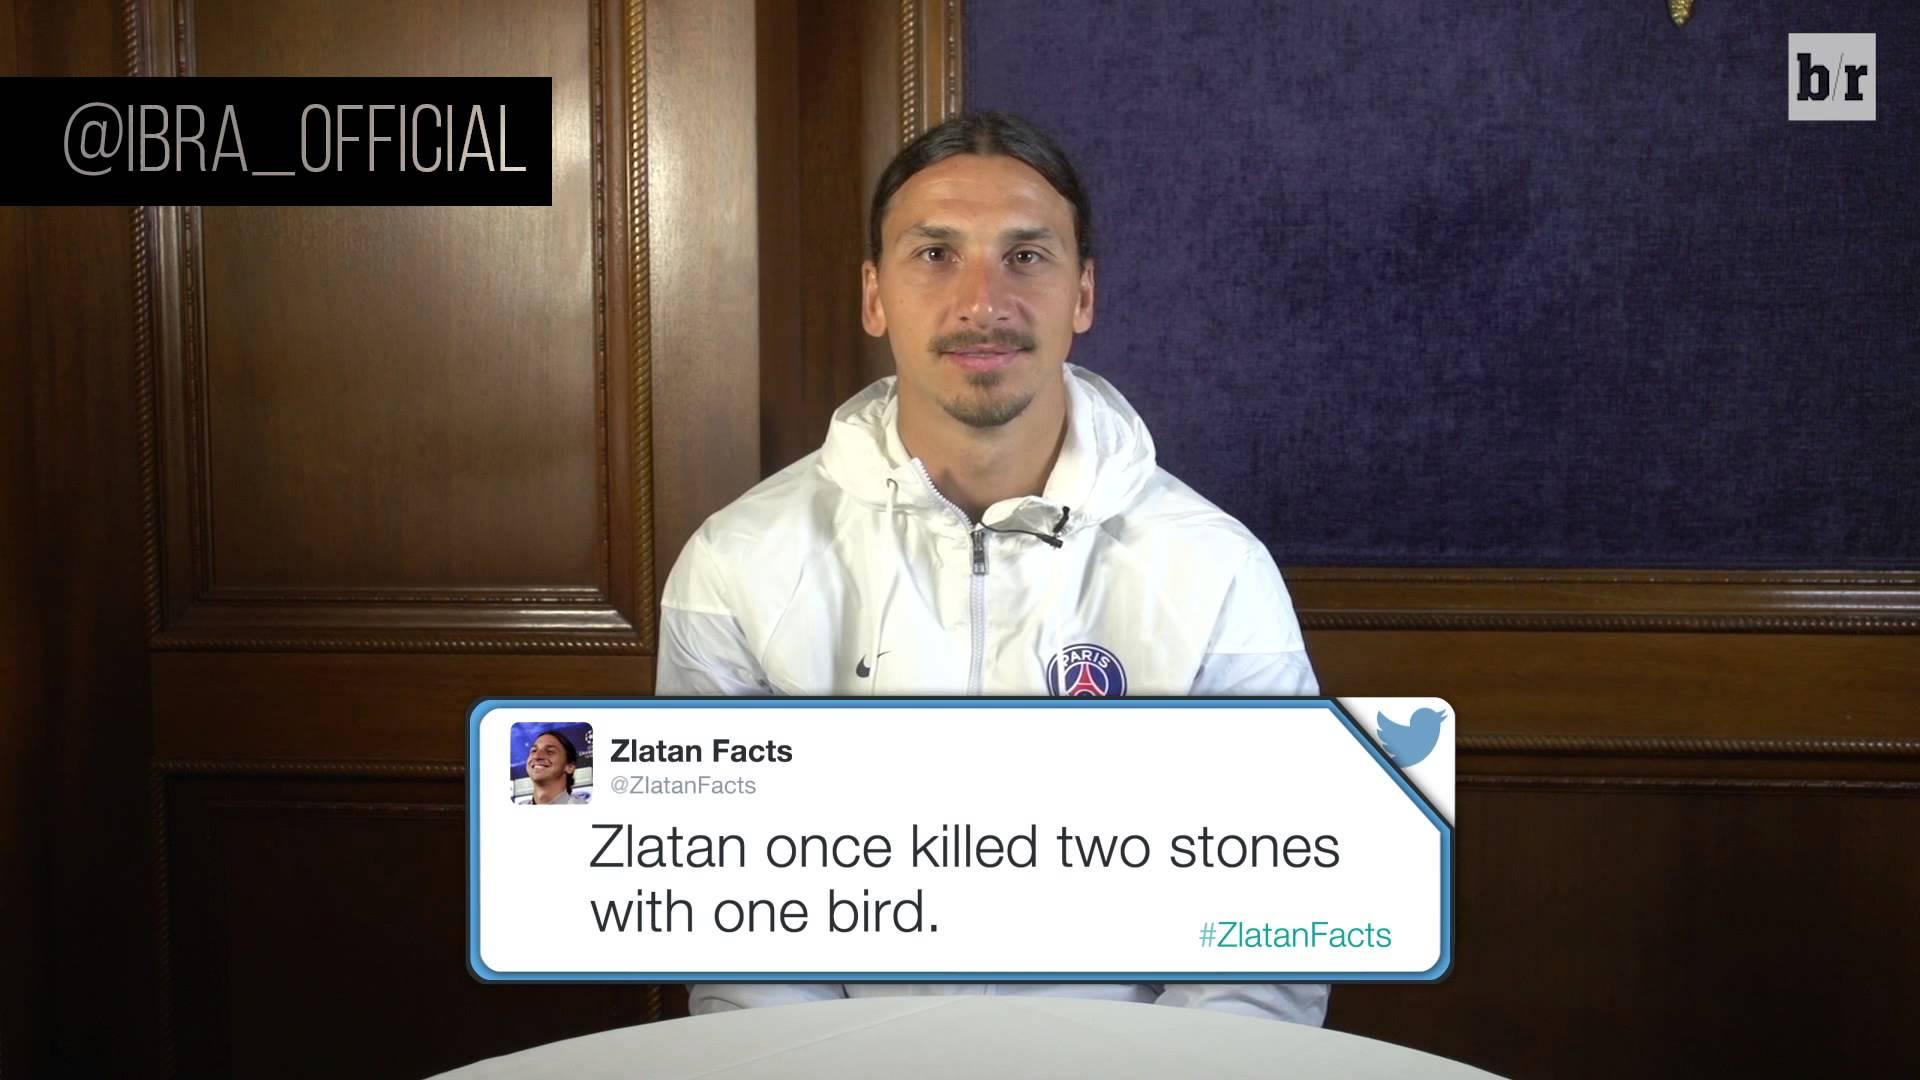 ВИДЕО: Златан Ибрахимовиќ чита шеги на своја сметка